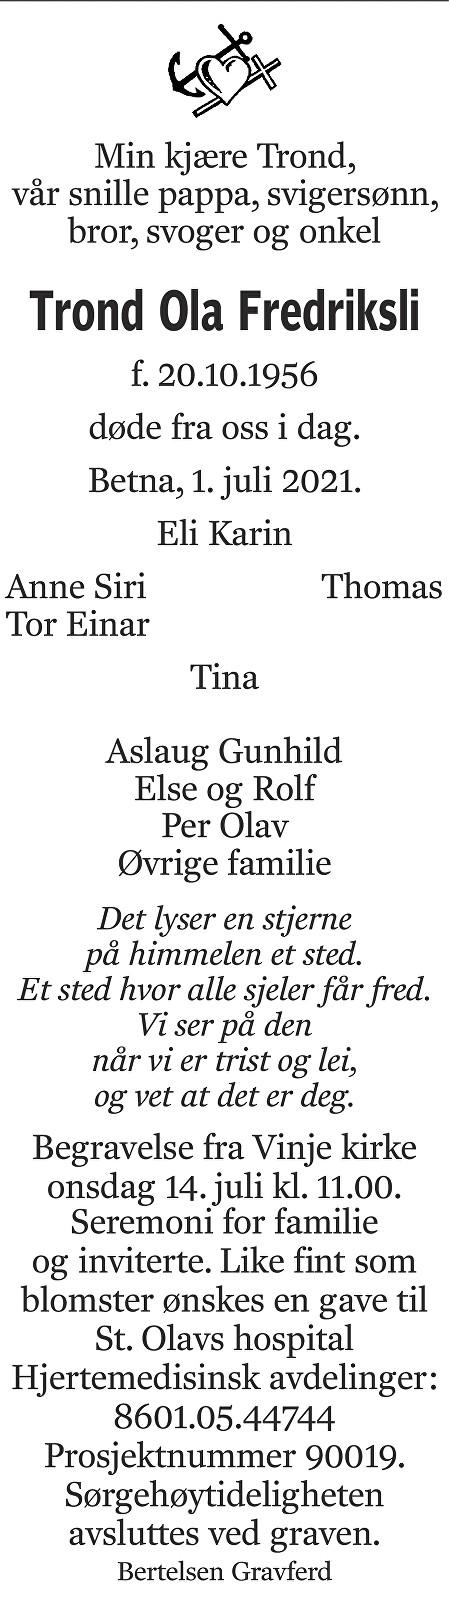 Trond Ola Fredriksli Dødsannonse